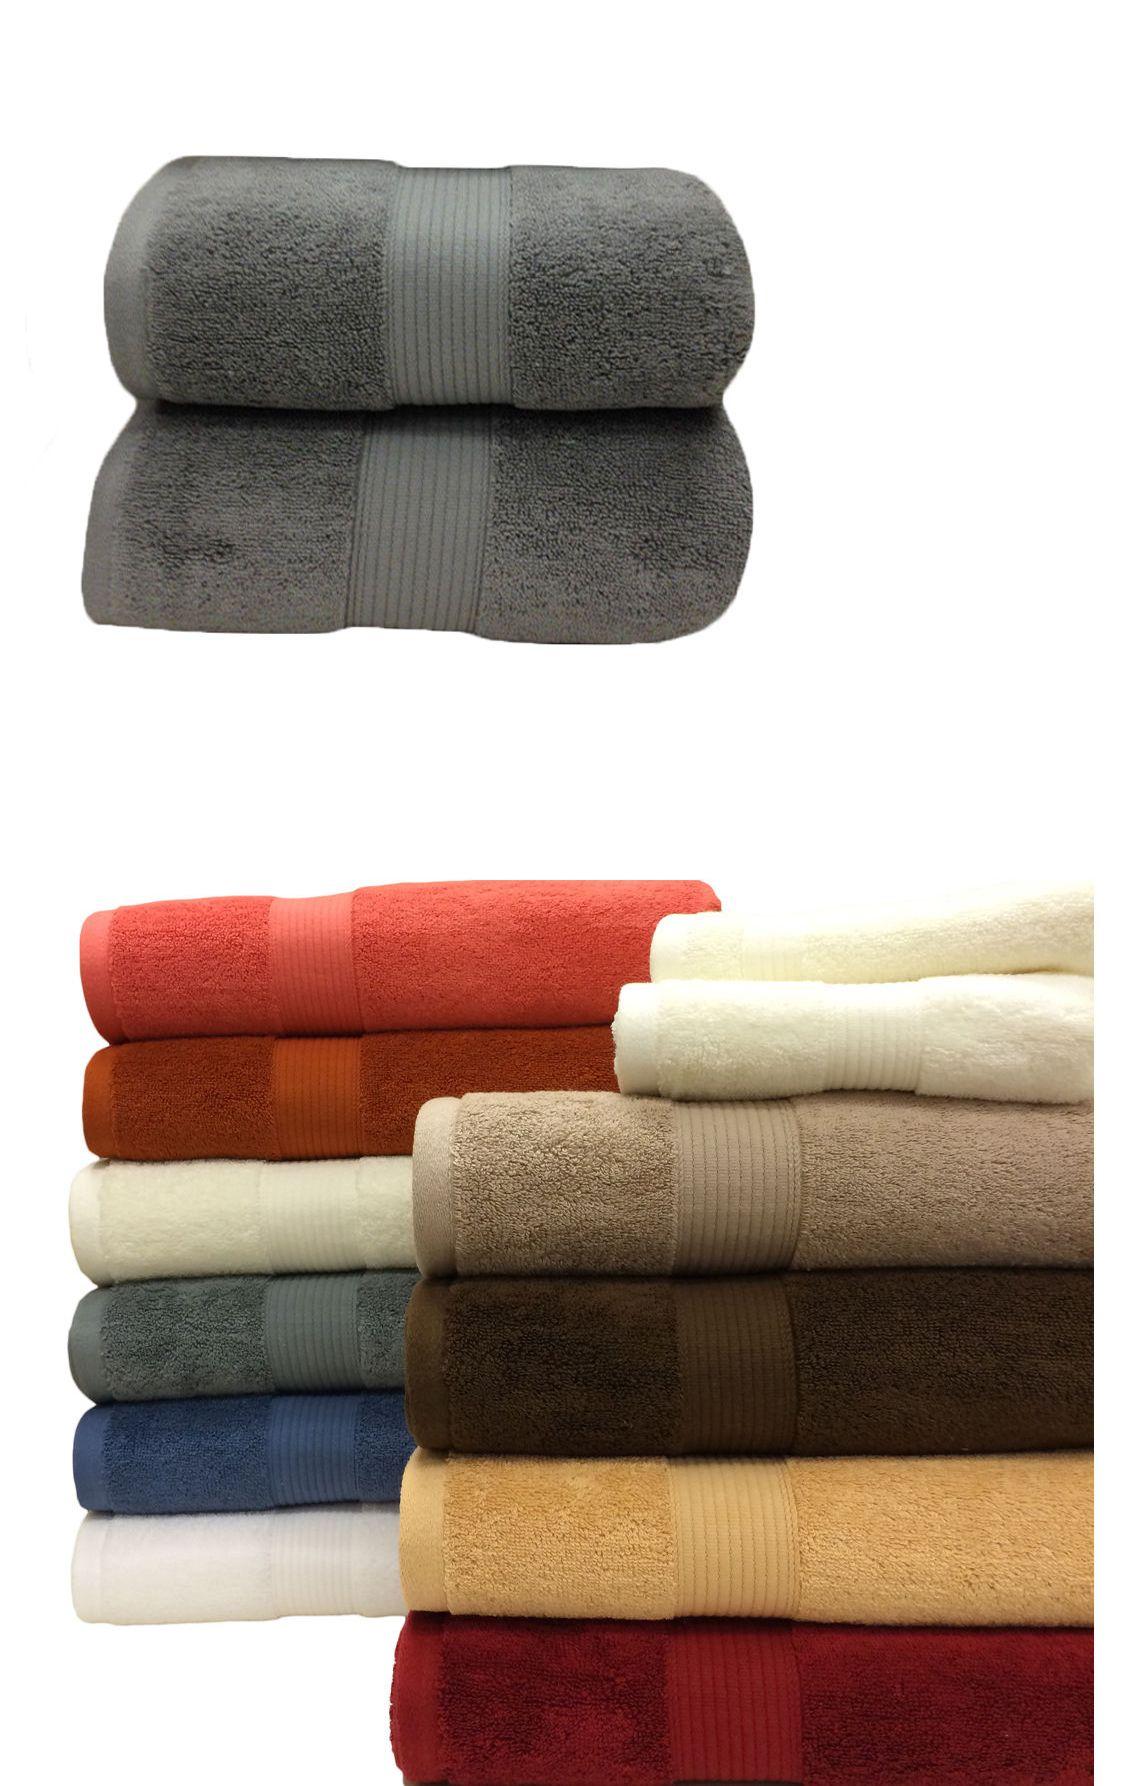 What Is A Bath Sheet Towels And Washcloths 40587 Gray 100% Cotton Ultra Soft Plush Bath